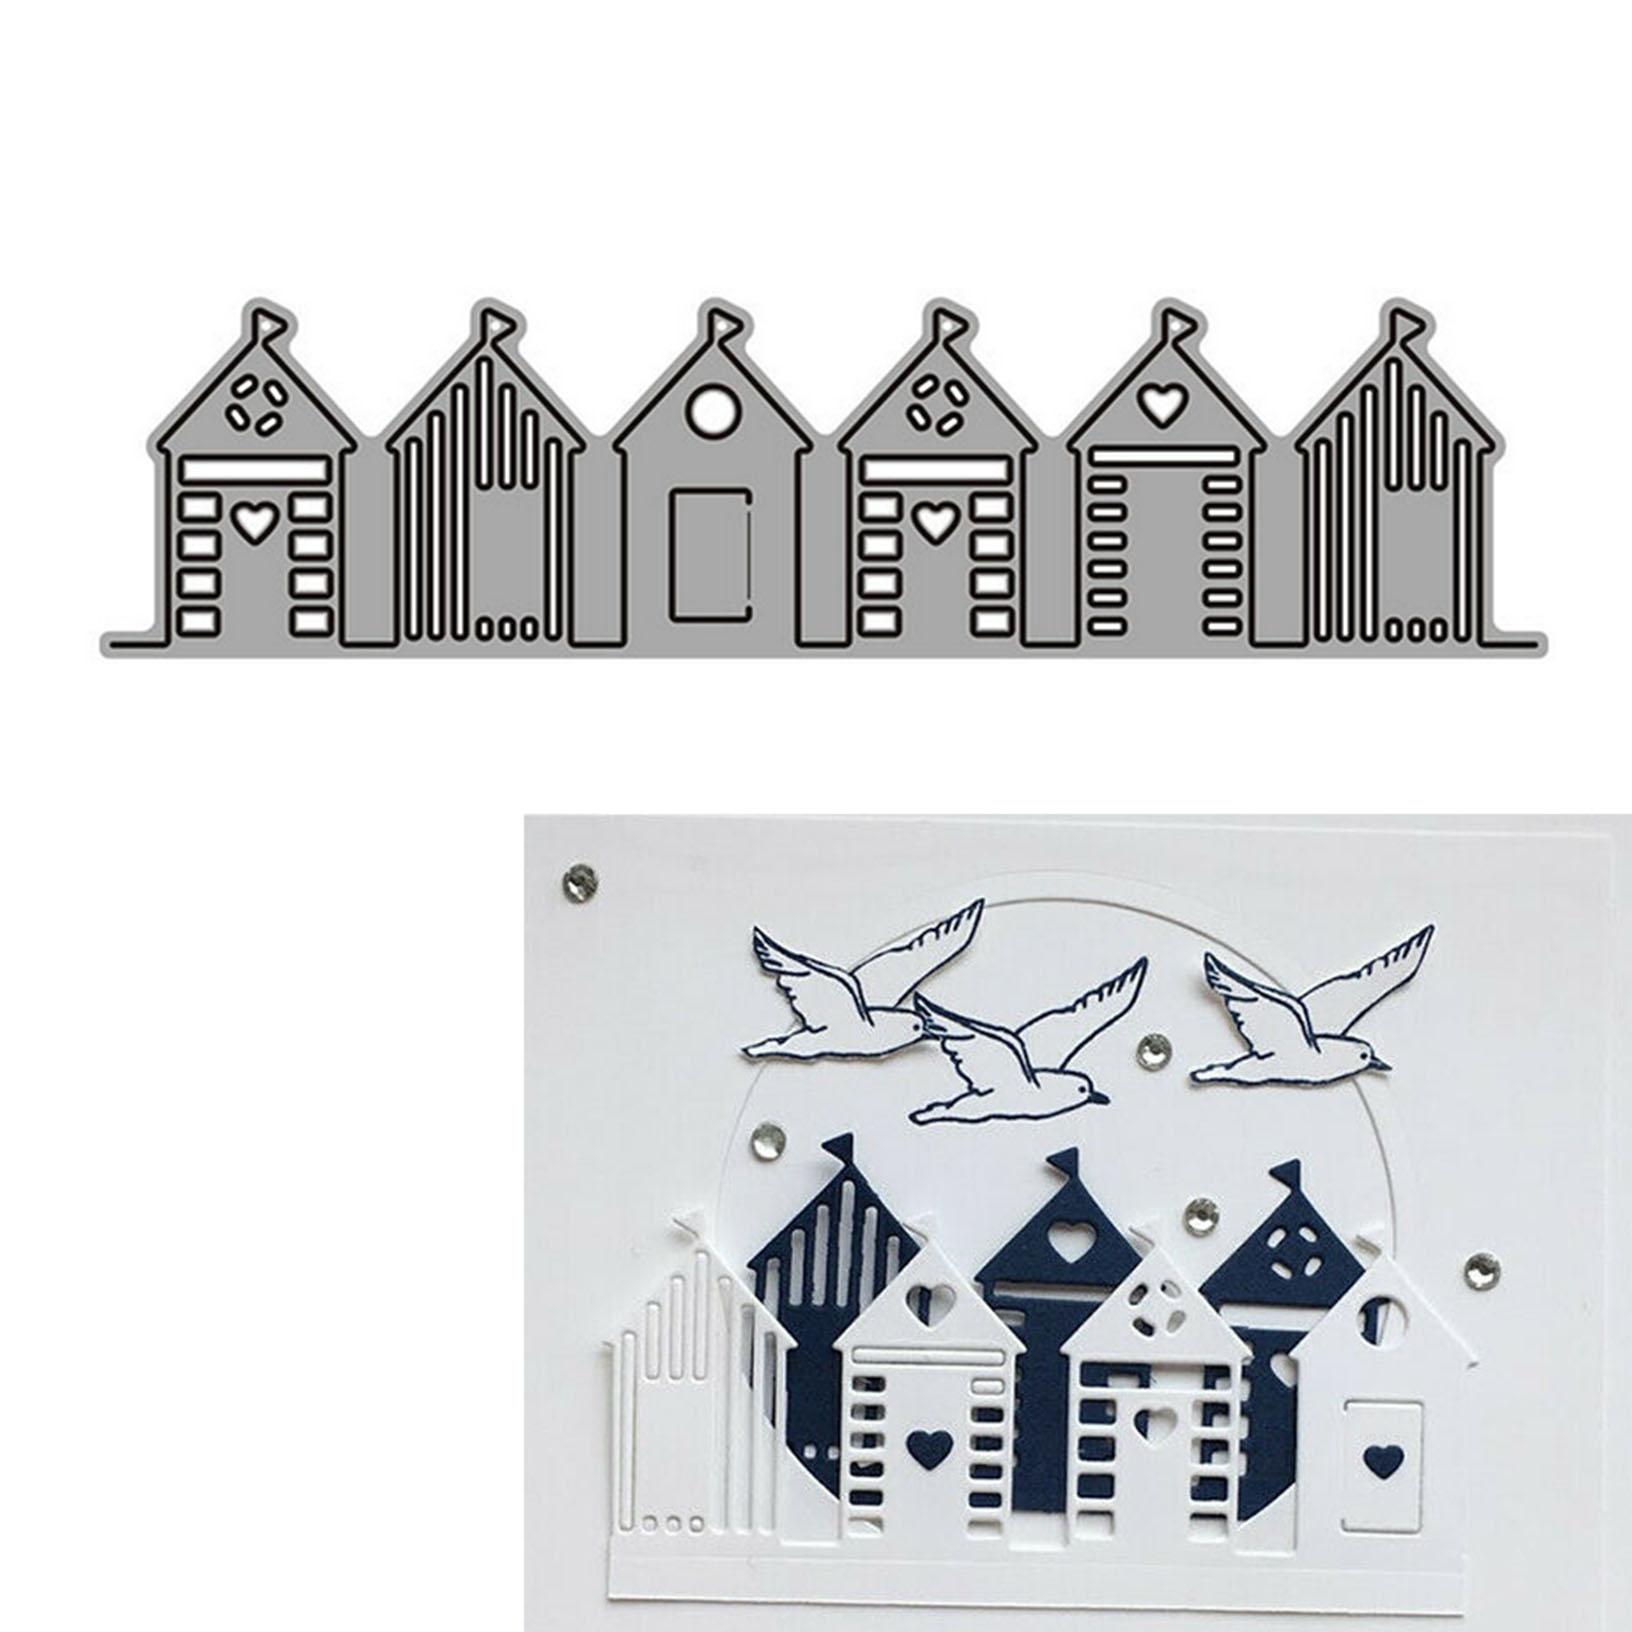 Beach Houses Edge Building Dies Metal Cutting Stencils Decorative Embossing DIY